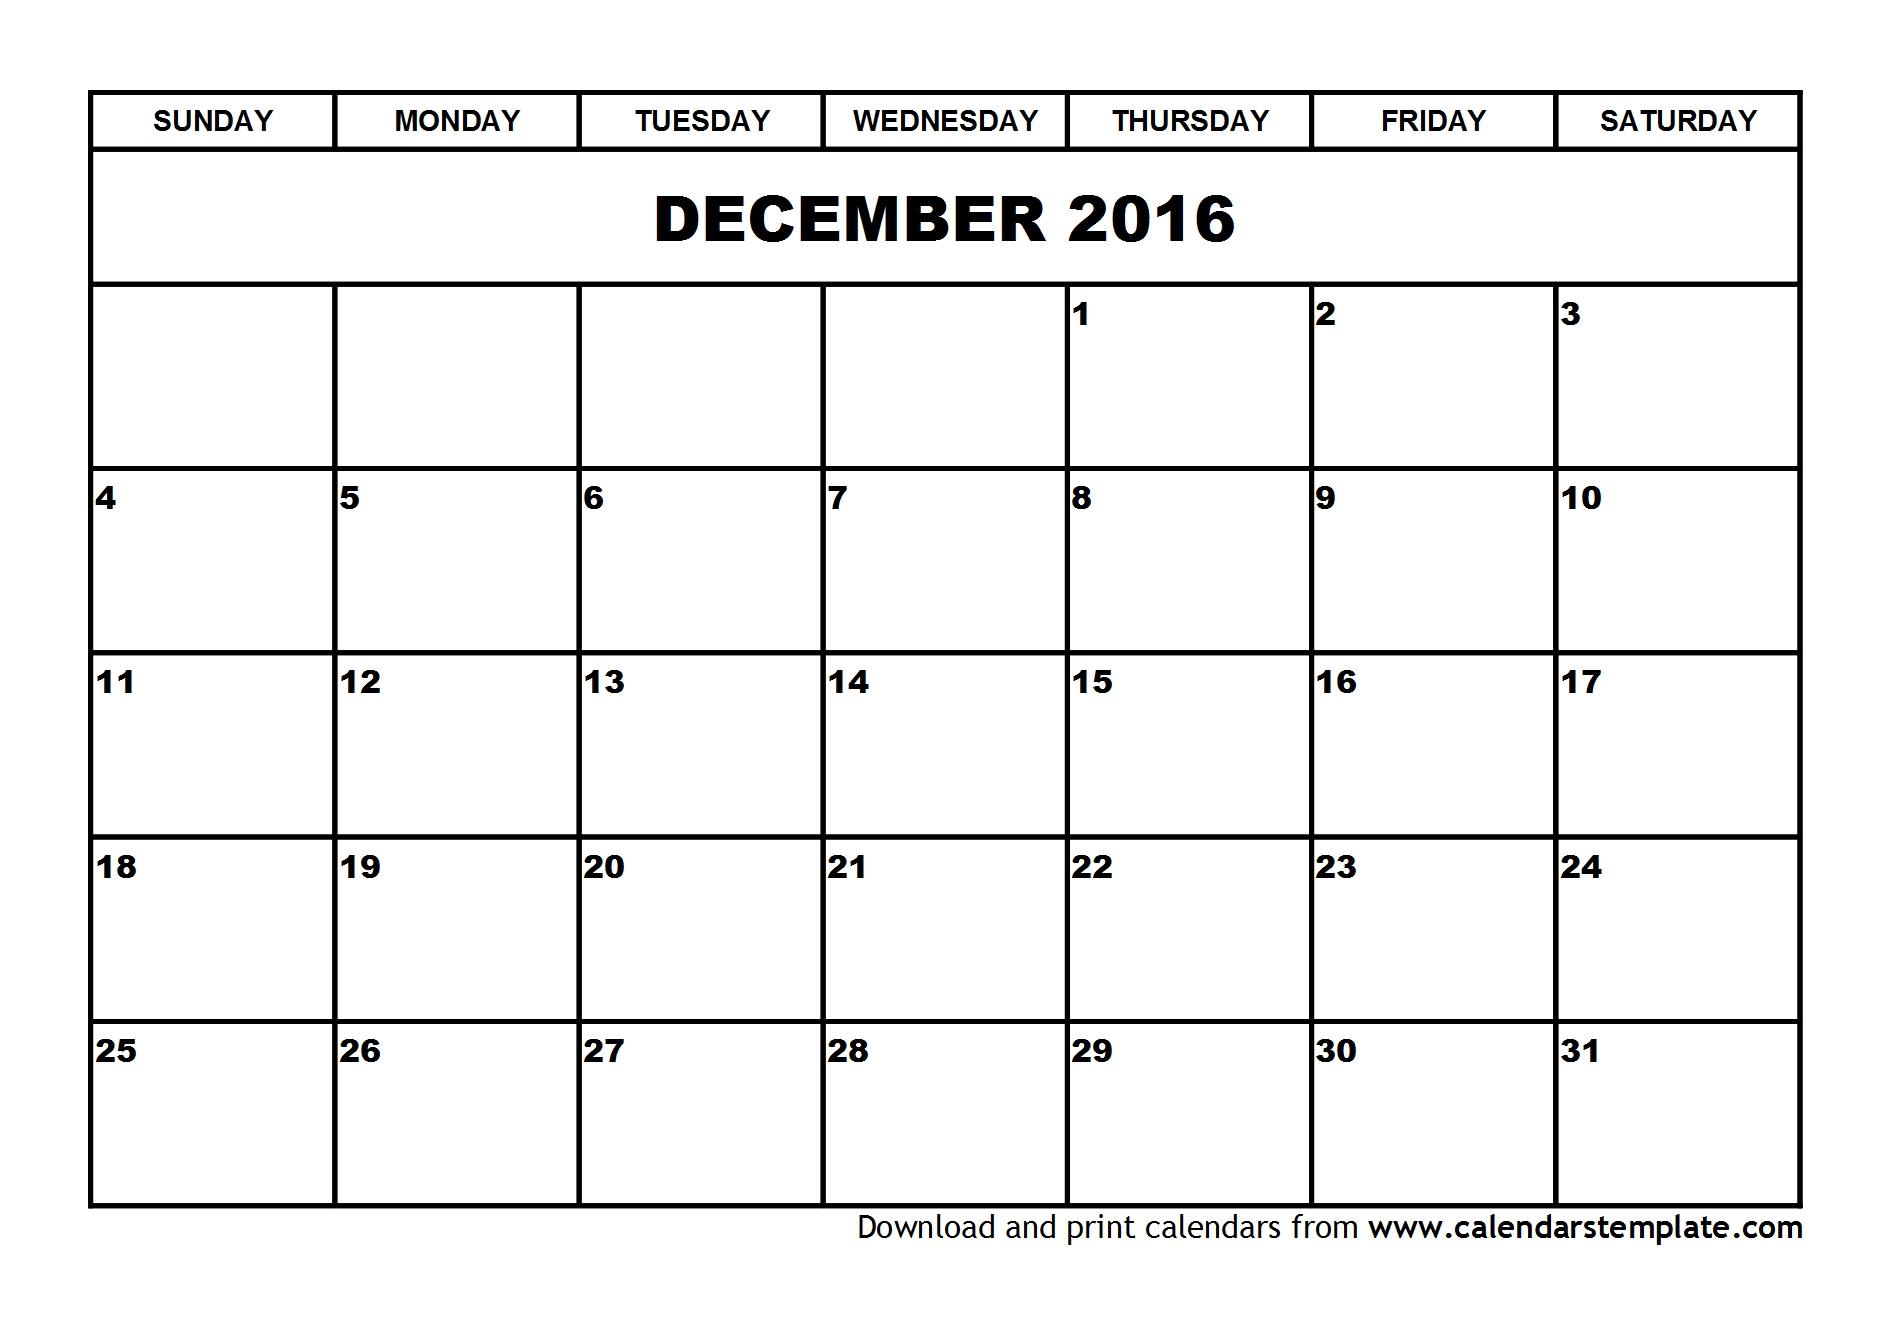 009 Blank Calendar Template Ideas November Printable December Pdf throughout Blank Calendar Template December